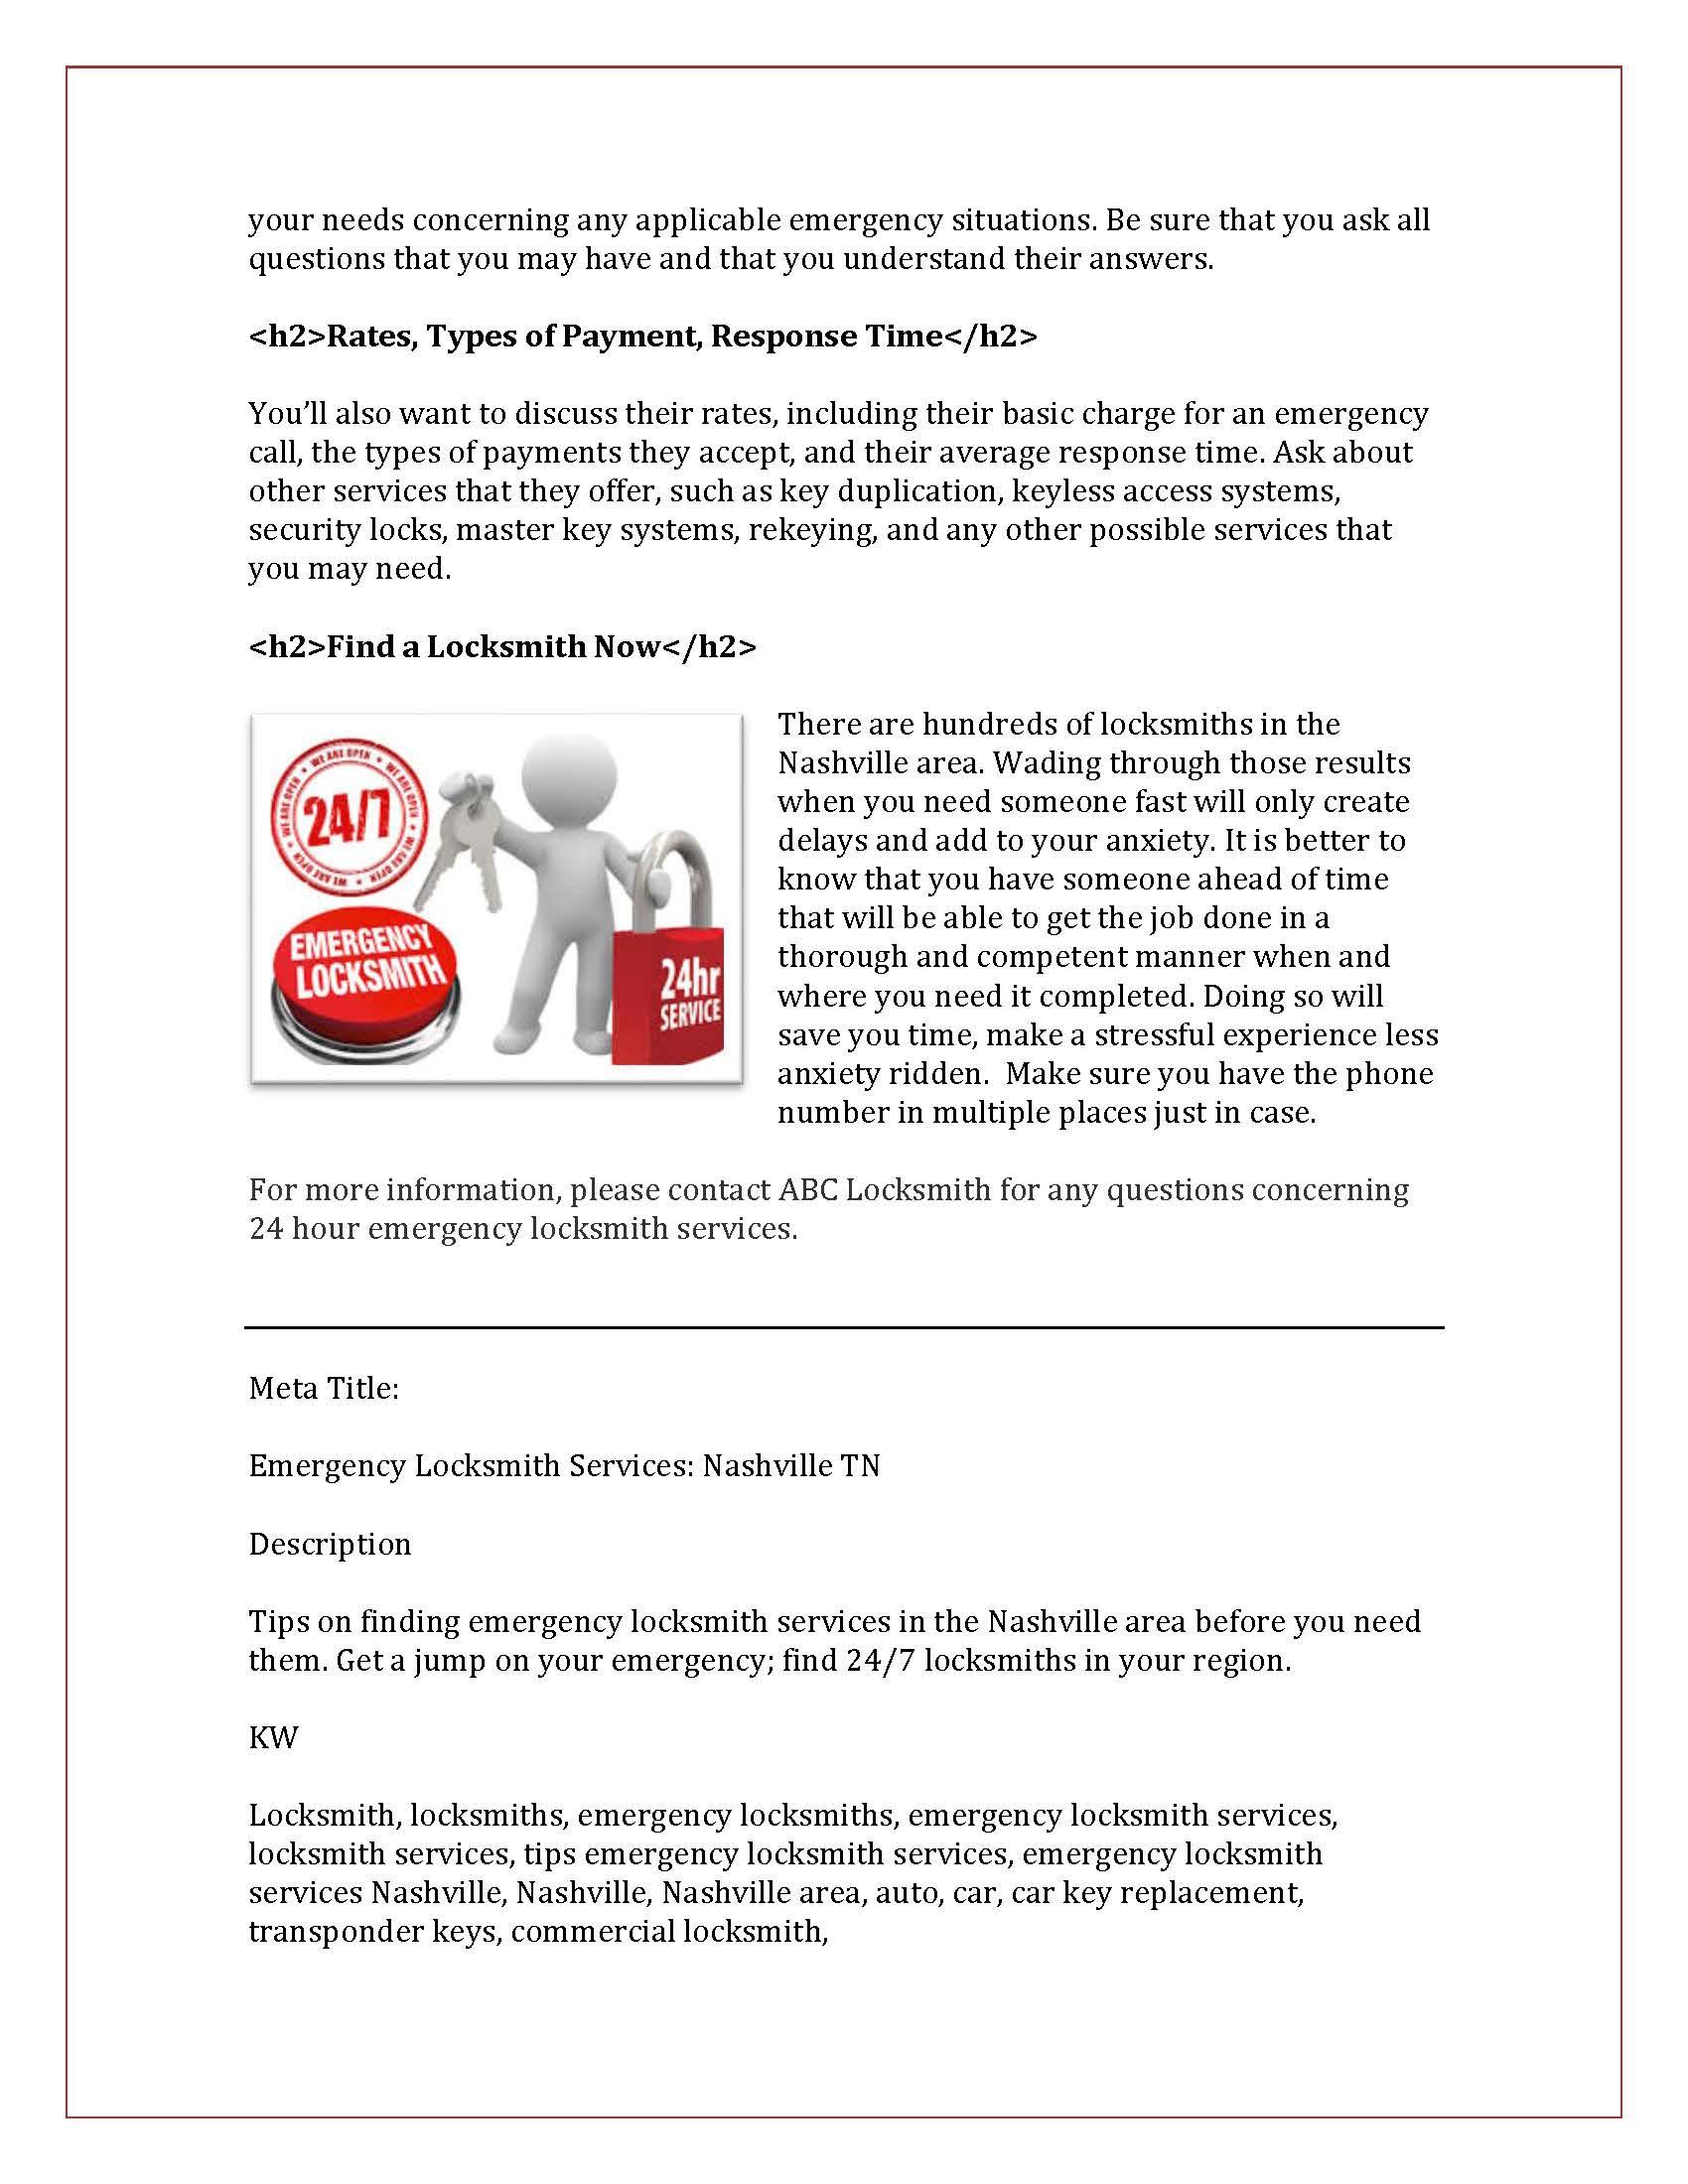 SEO Tips on Emergency Locksmith Services Nashville_Page_2